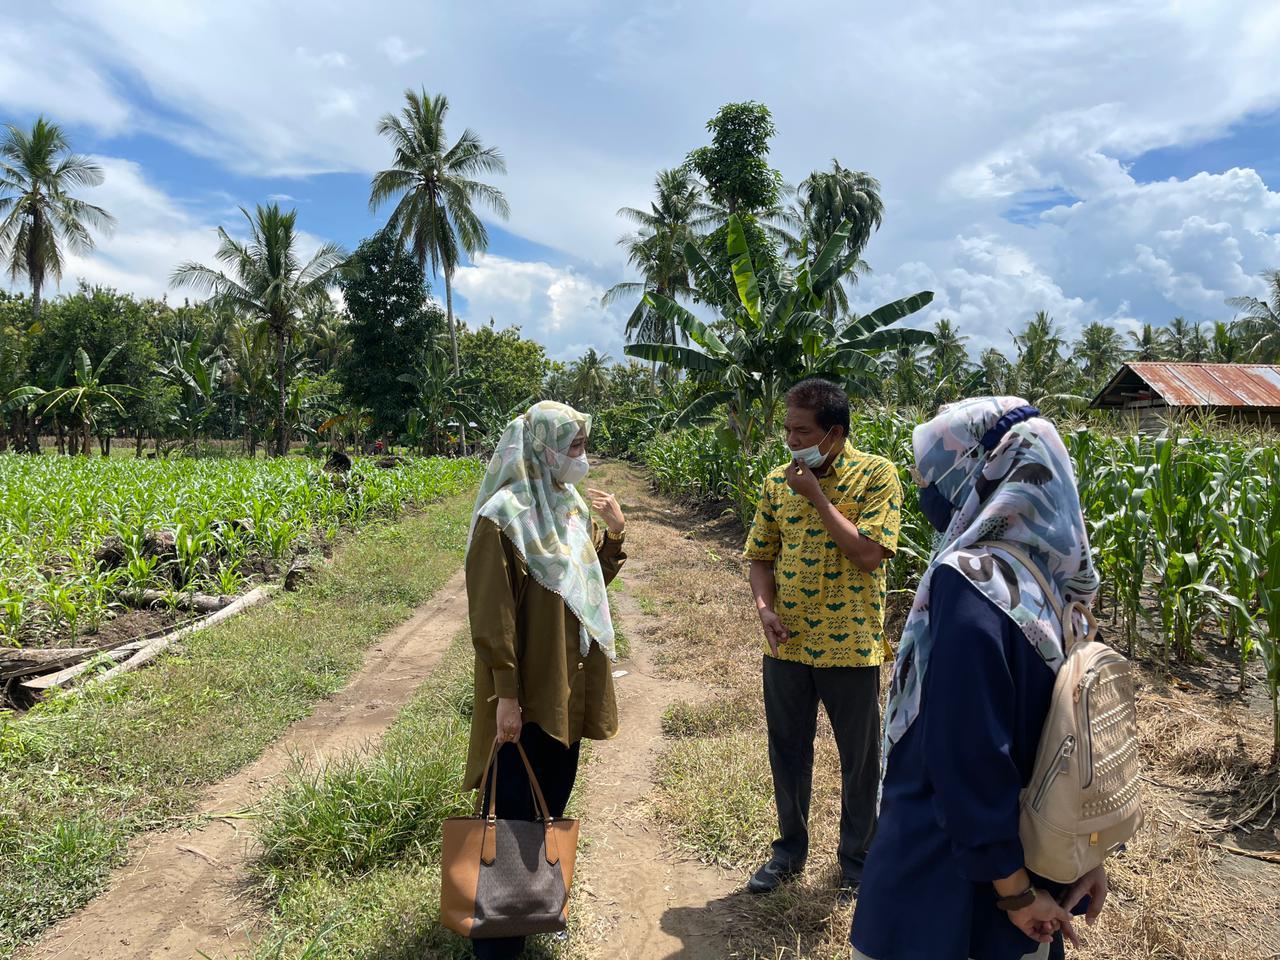 Gelar Kunjungan Dapil, Andi Nurhidayati Tinjau Lokasi Pembangunan Jalan Tani di Lompulle